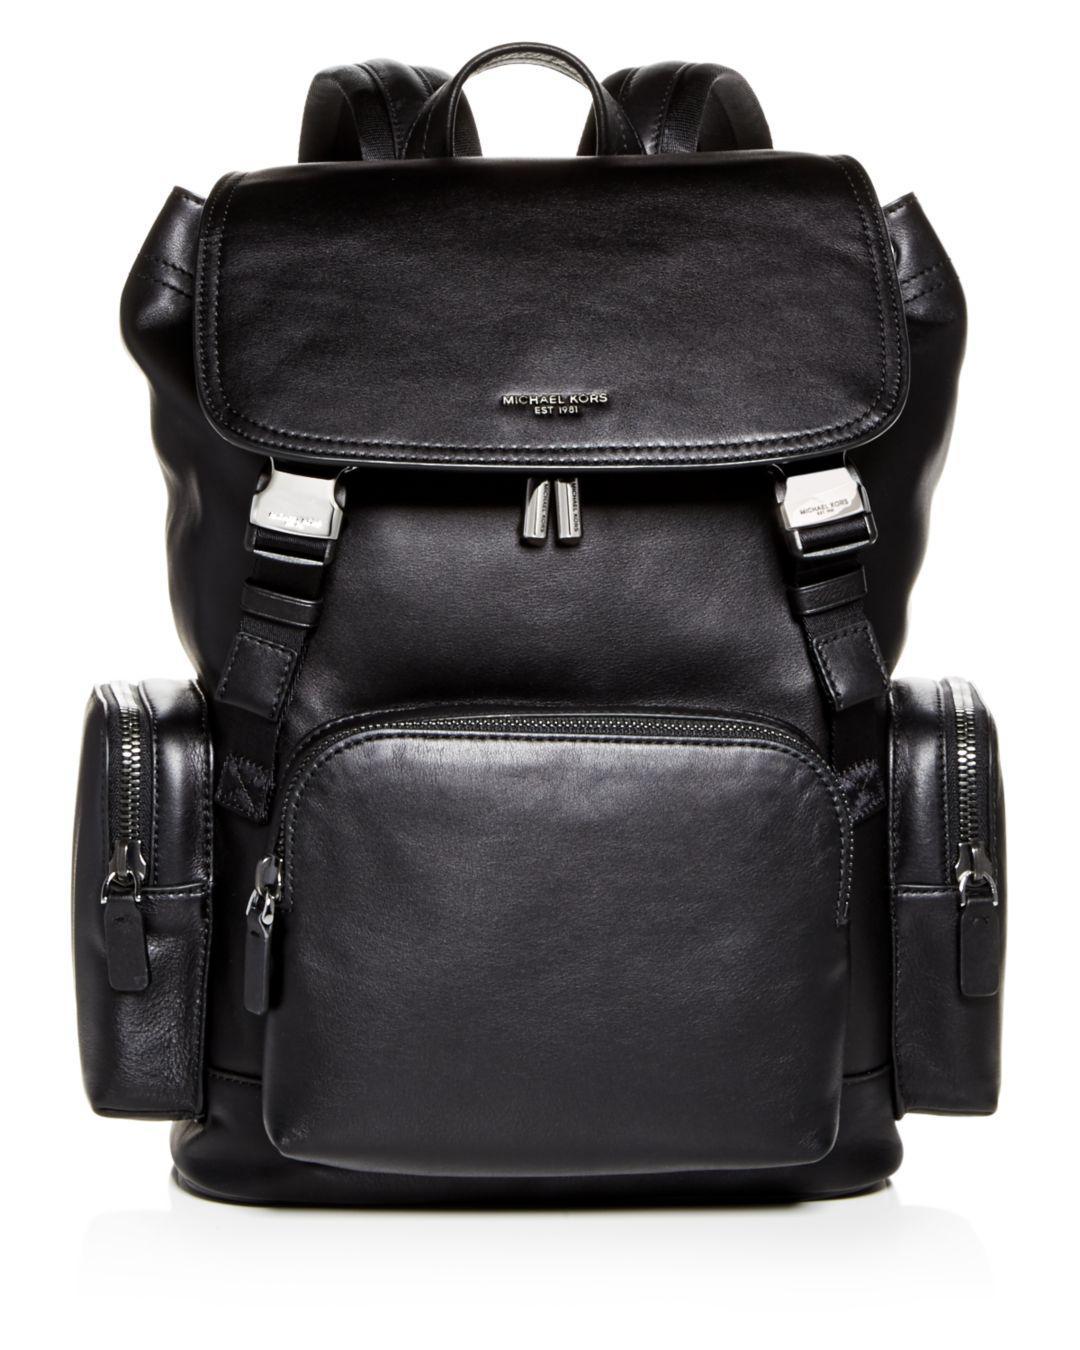 Michael Kors Henry Leather Rucksack in Black for Men - Save 60% - Lyst 6b8dda20cd98c